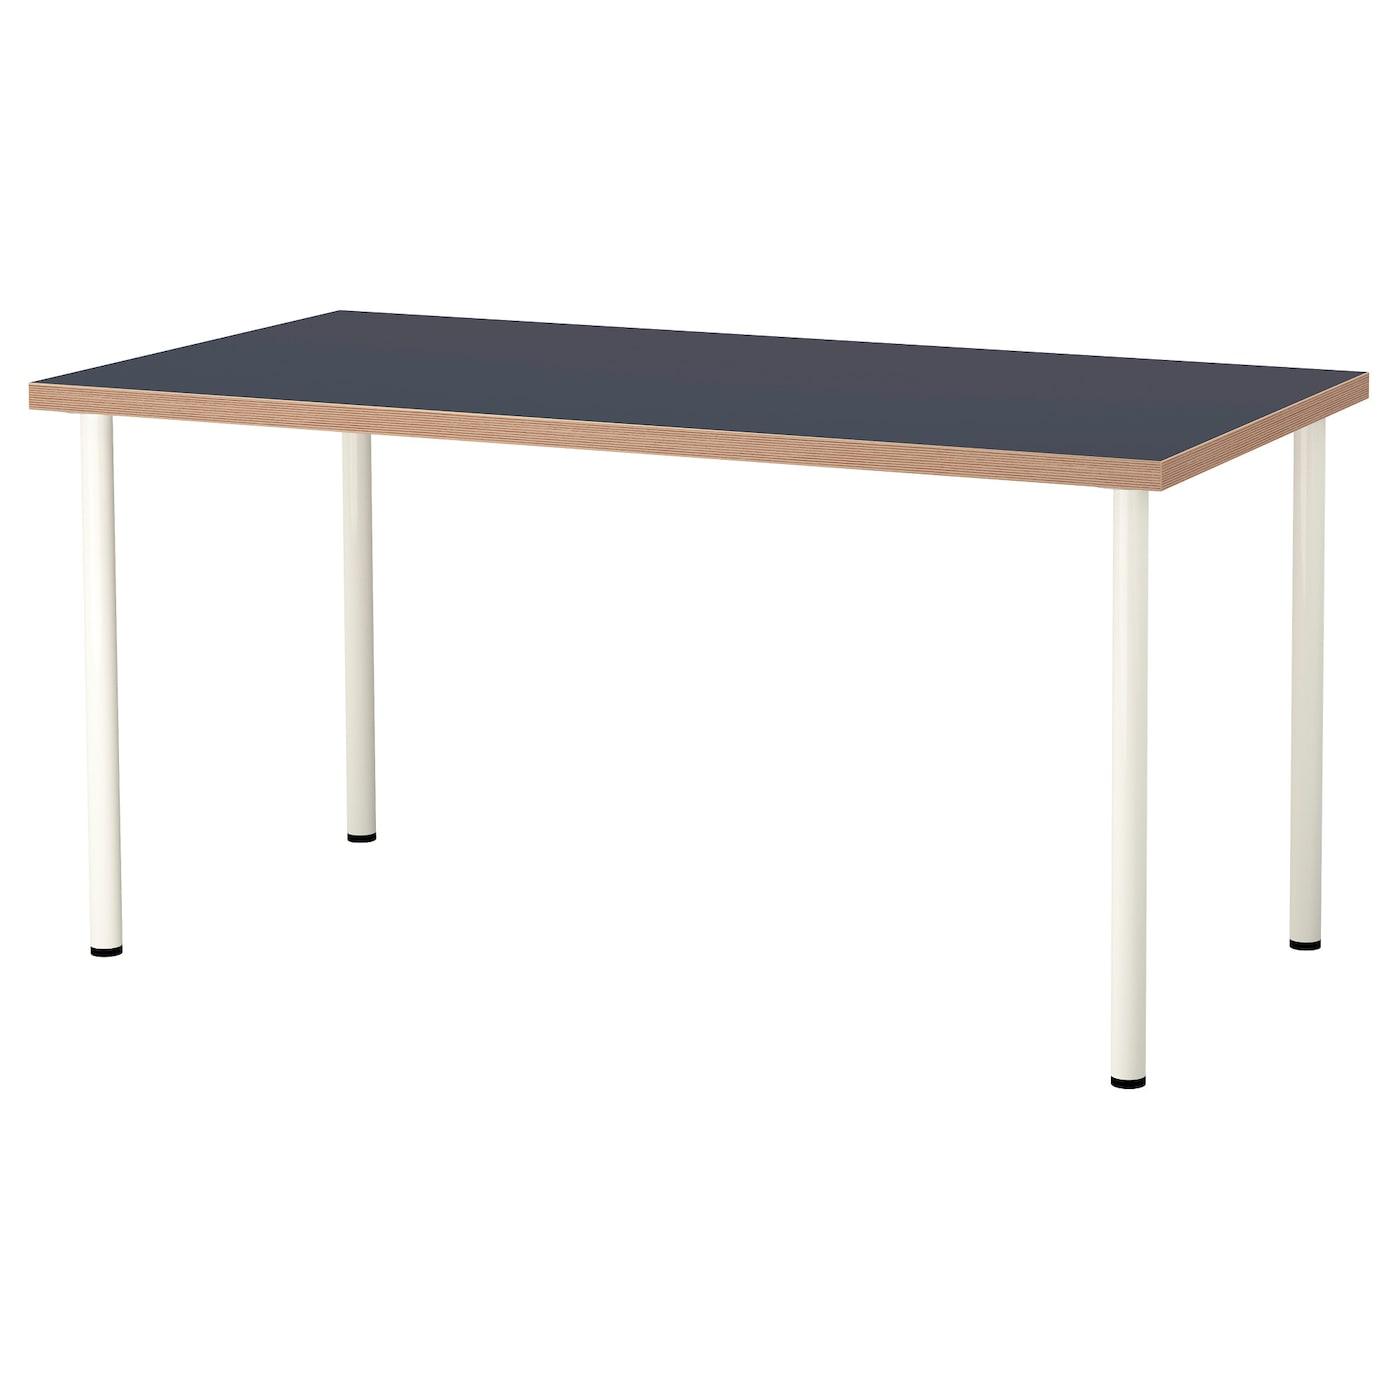 LINNMON / ADILS, Tisch, blau 092.143.32